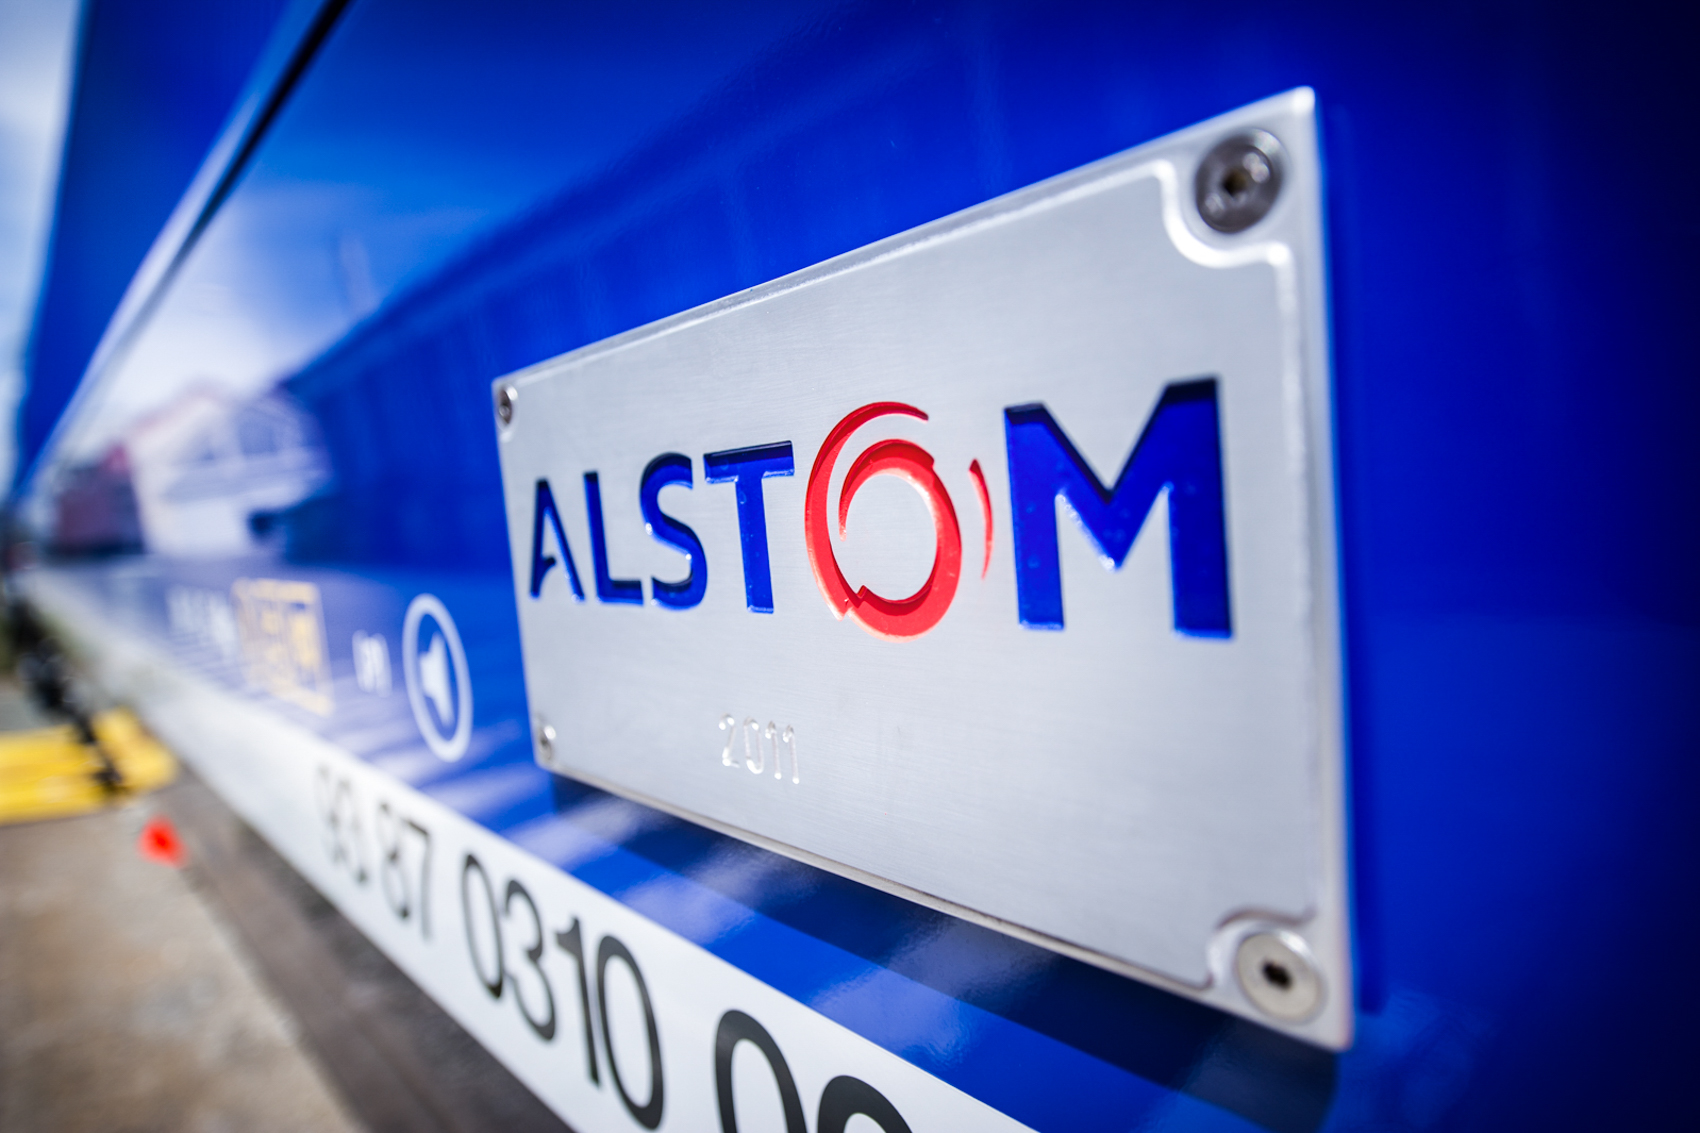 Reportage photo Alstom - Abaca Corporate